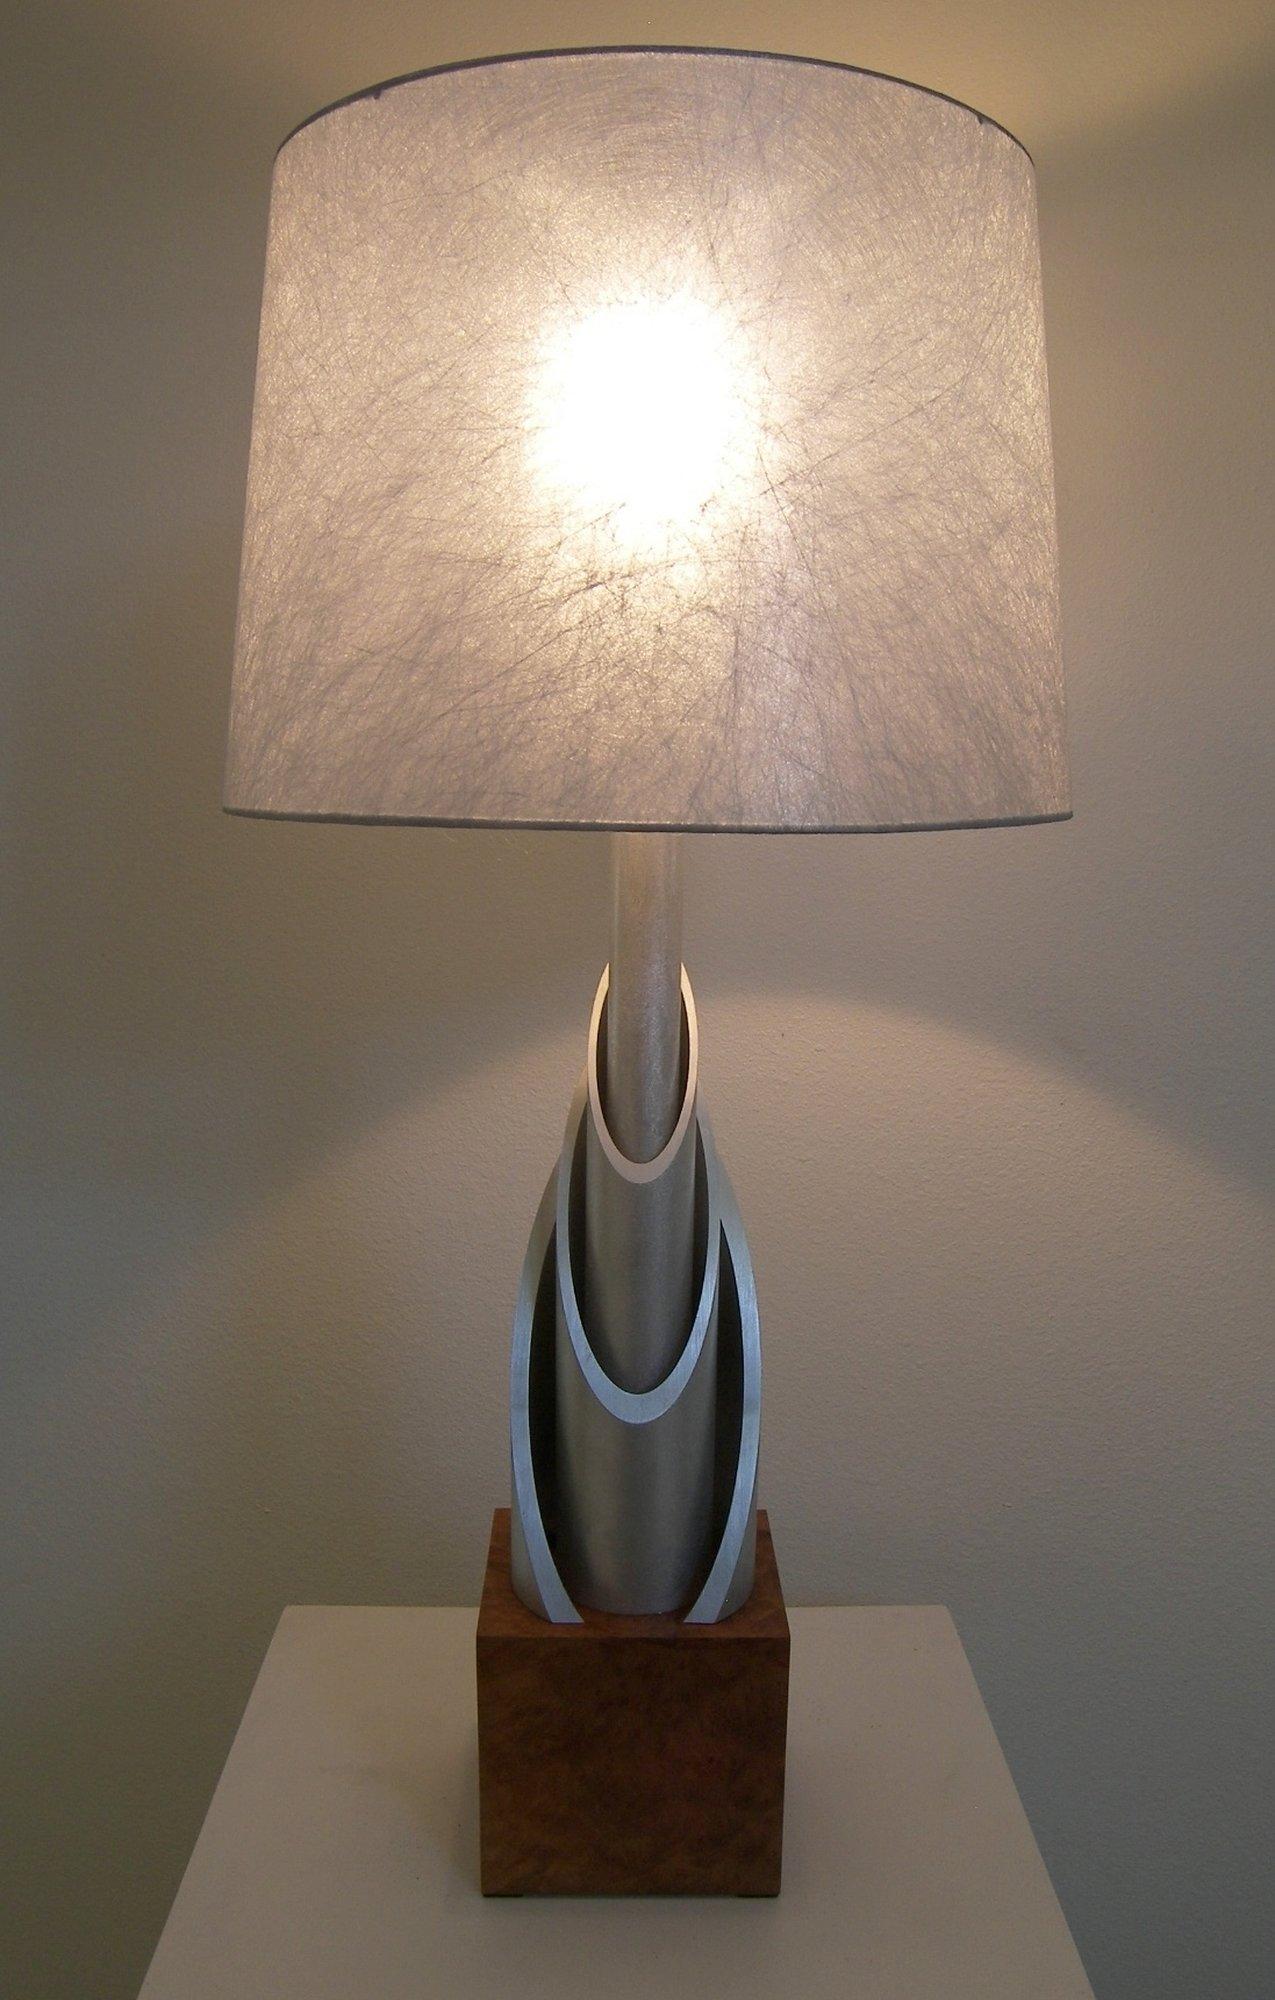 Concentric lamp